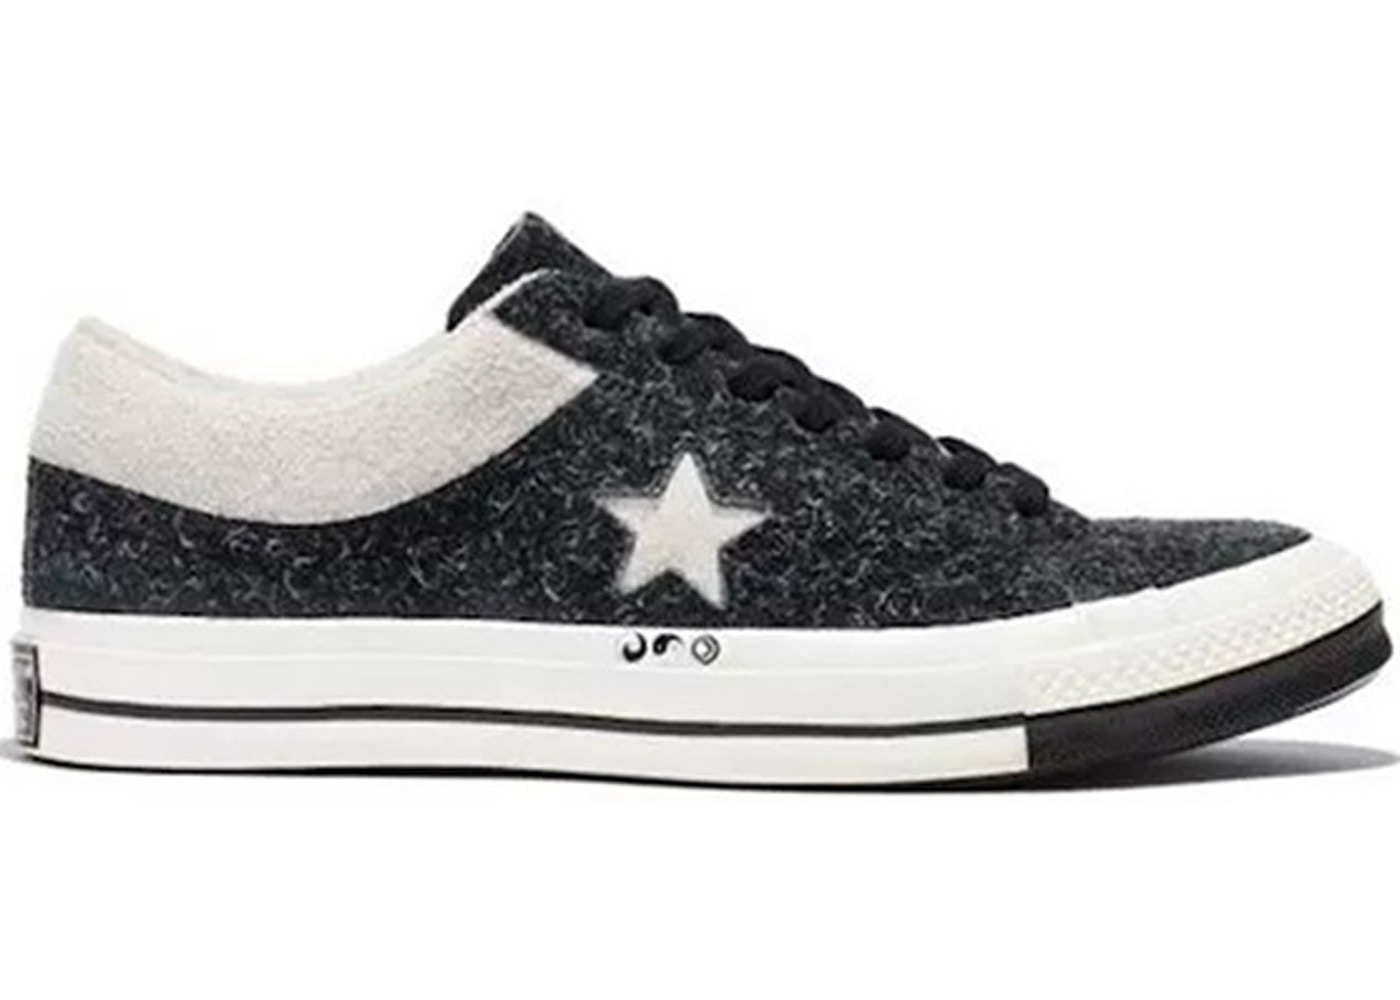 012af5c30746 Converse One Star Ox Clot Black White